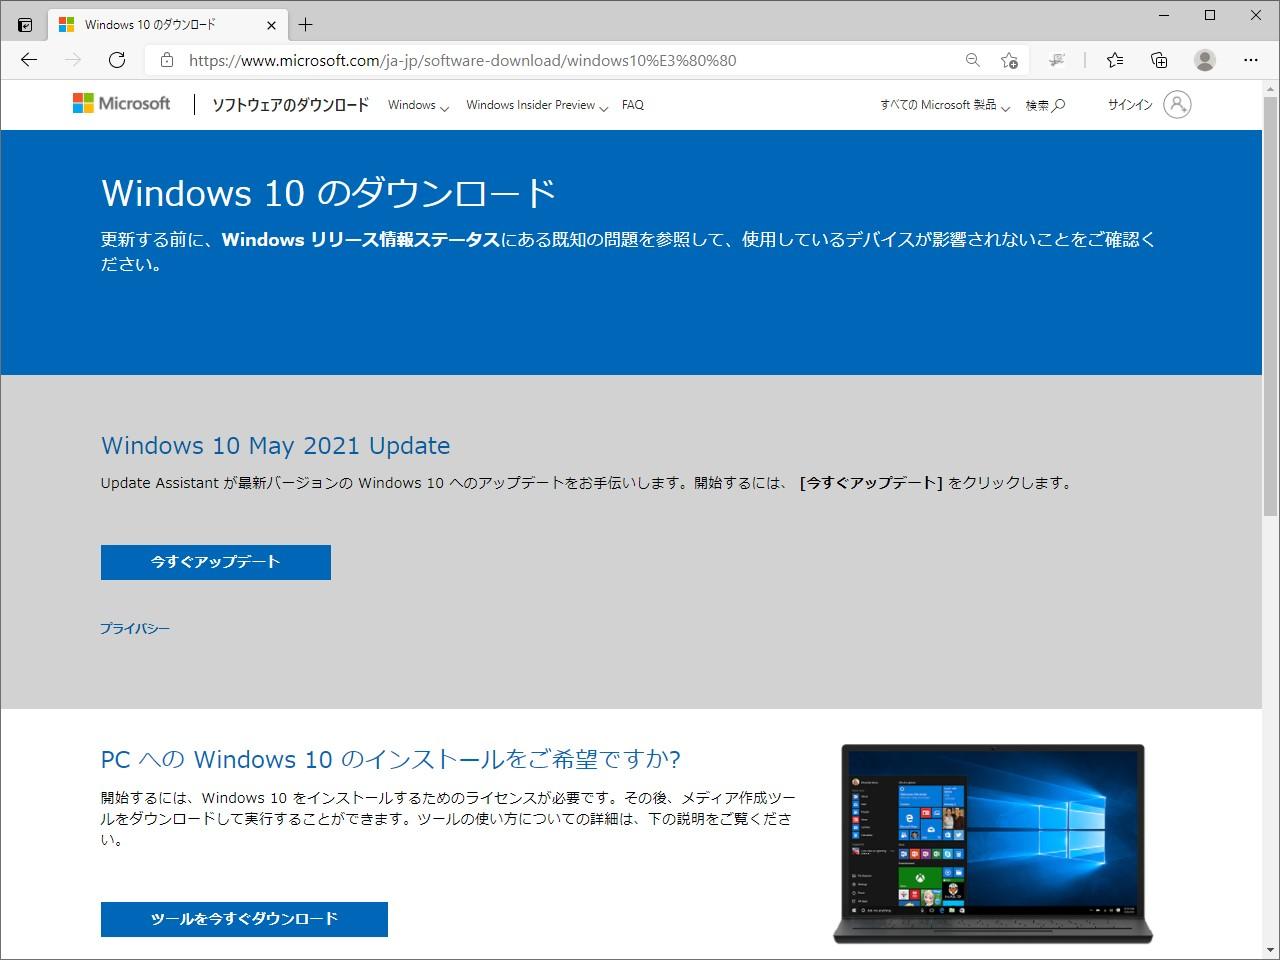 Microsoft、「Windows 10 May 2021 Update(バージョン 21H1)」を一般公開